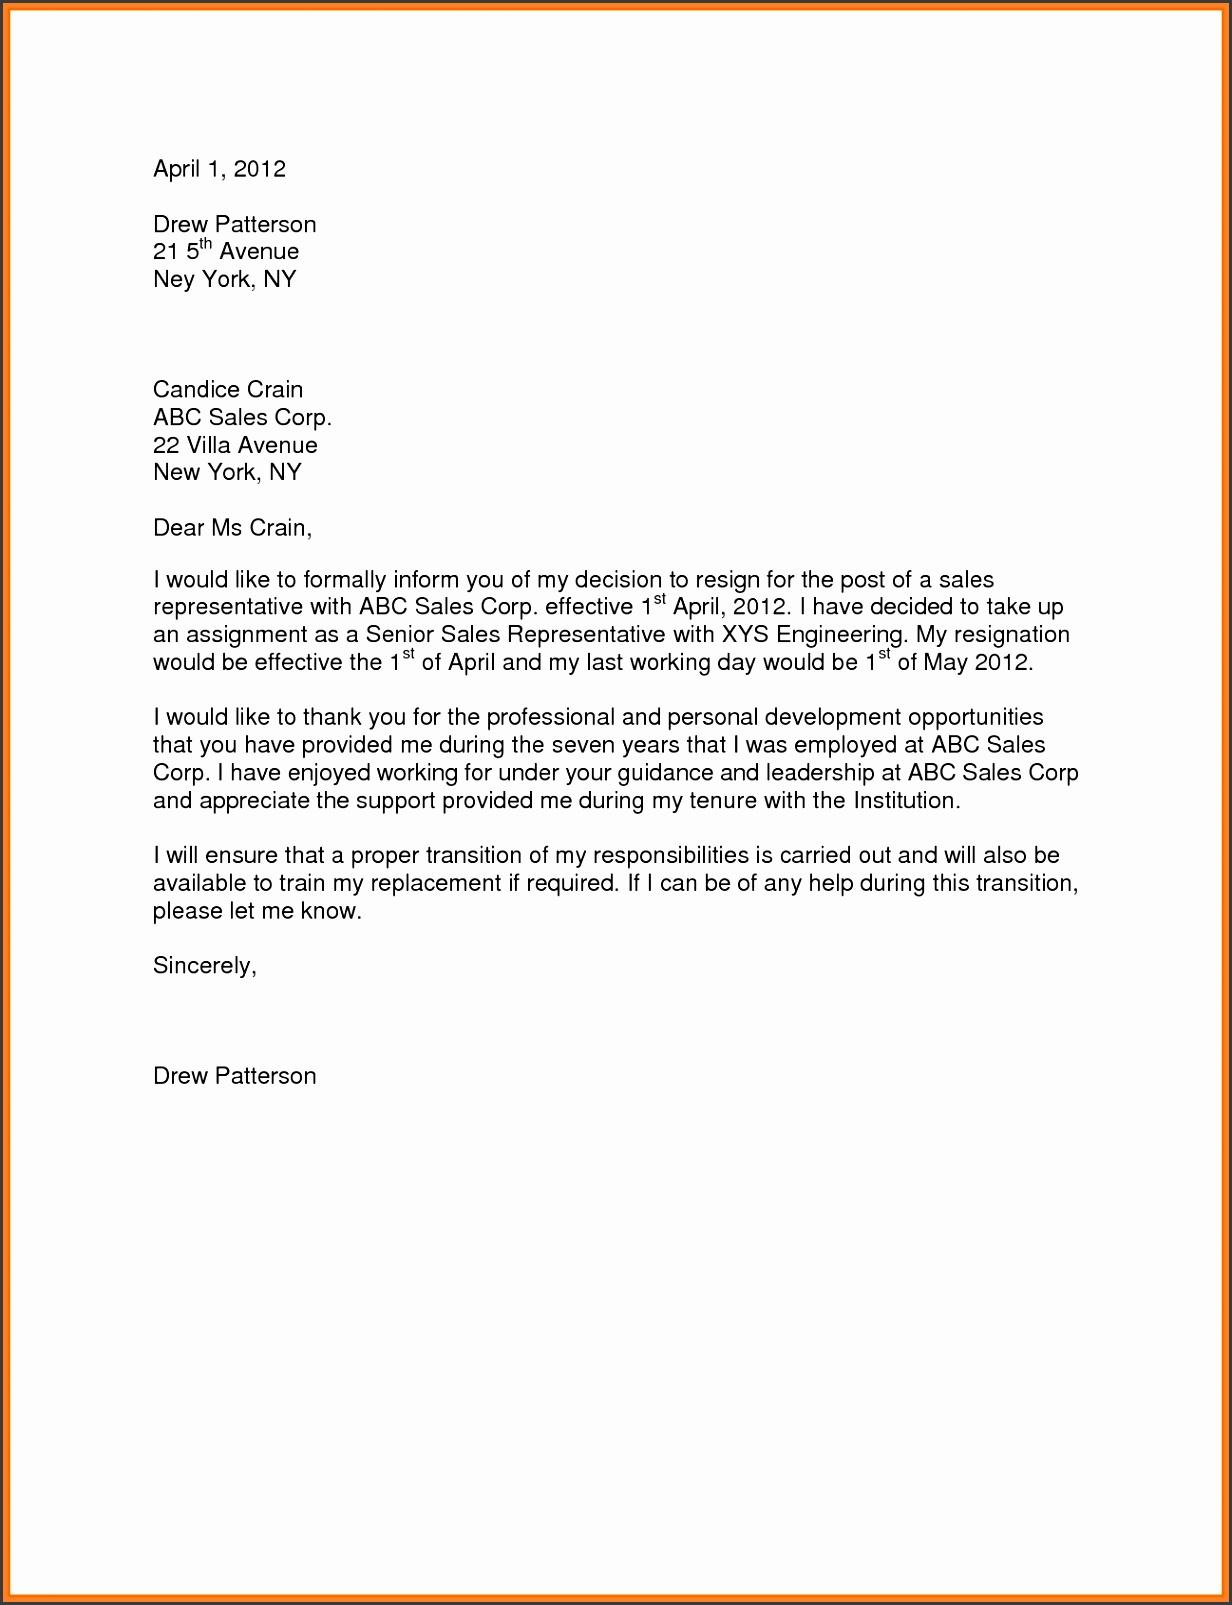 sample for resignation letter one month noticesignation letter template 1 month notice cghmnugi